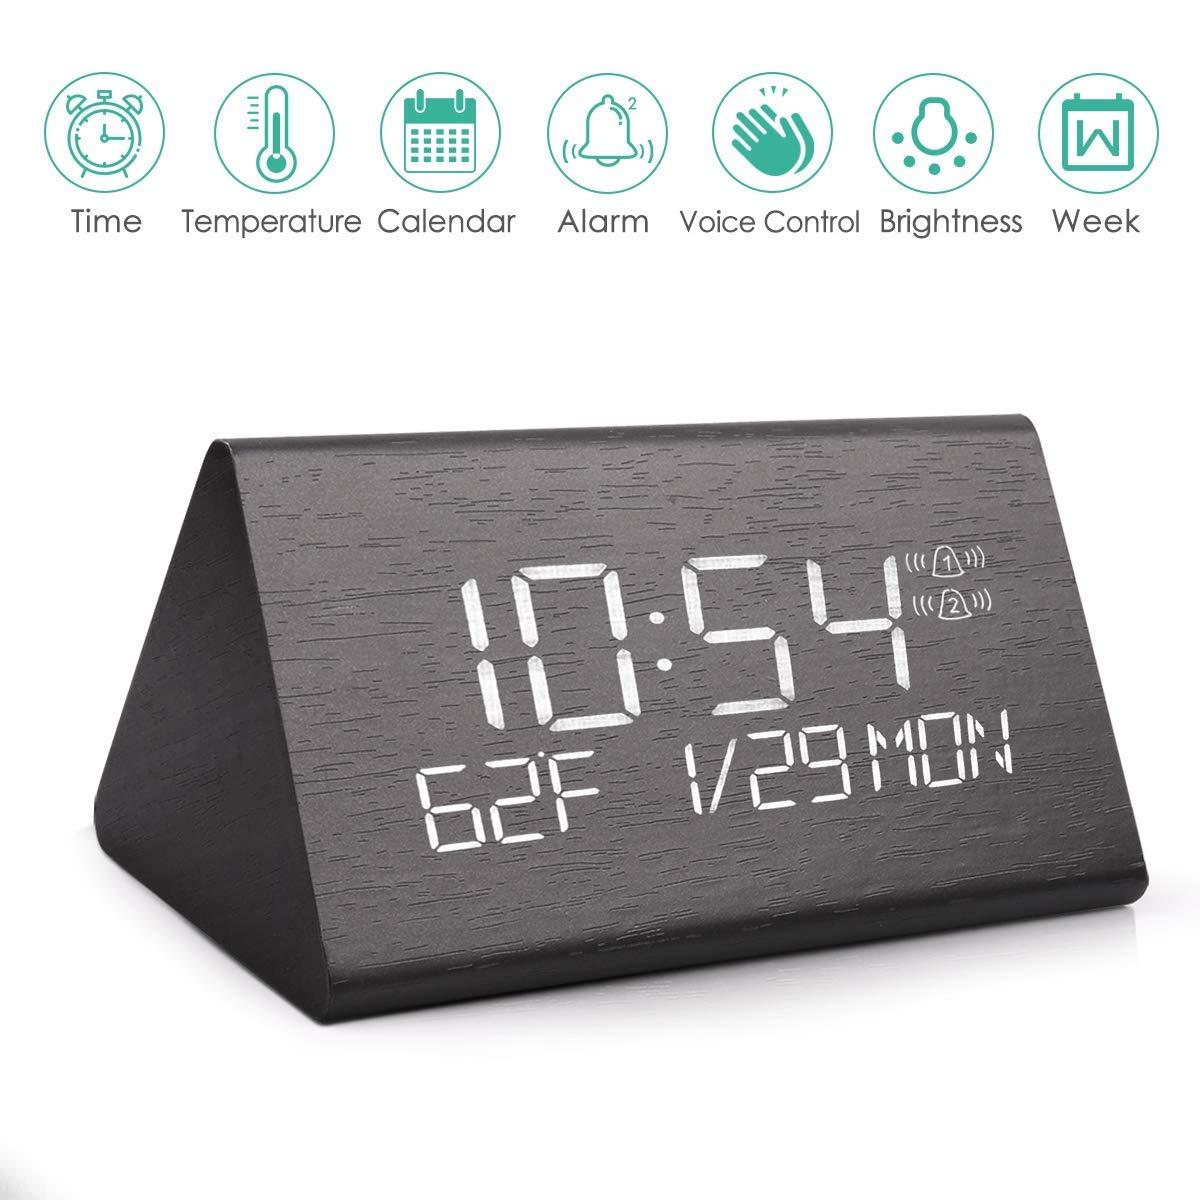 AZbornaz Wood Alarm Clock Block, Wooden LED Digital Electronic Bedside Shelf Desk Display – Wireless Battery Power, USB Charger, Dimmable, Calendar Date, Temperature, Voice Control – Modern Black